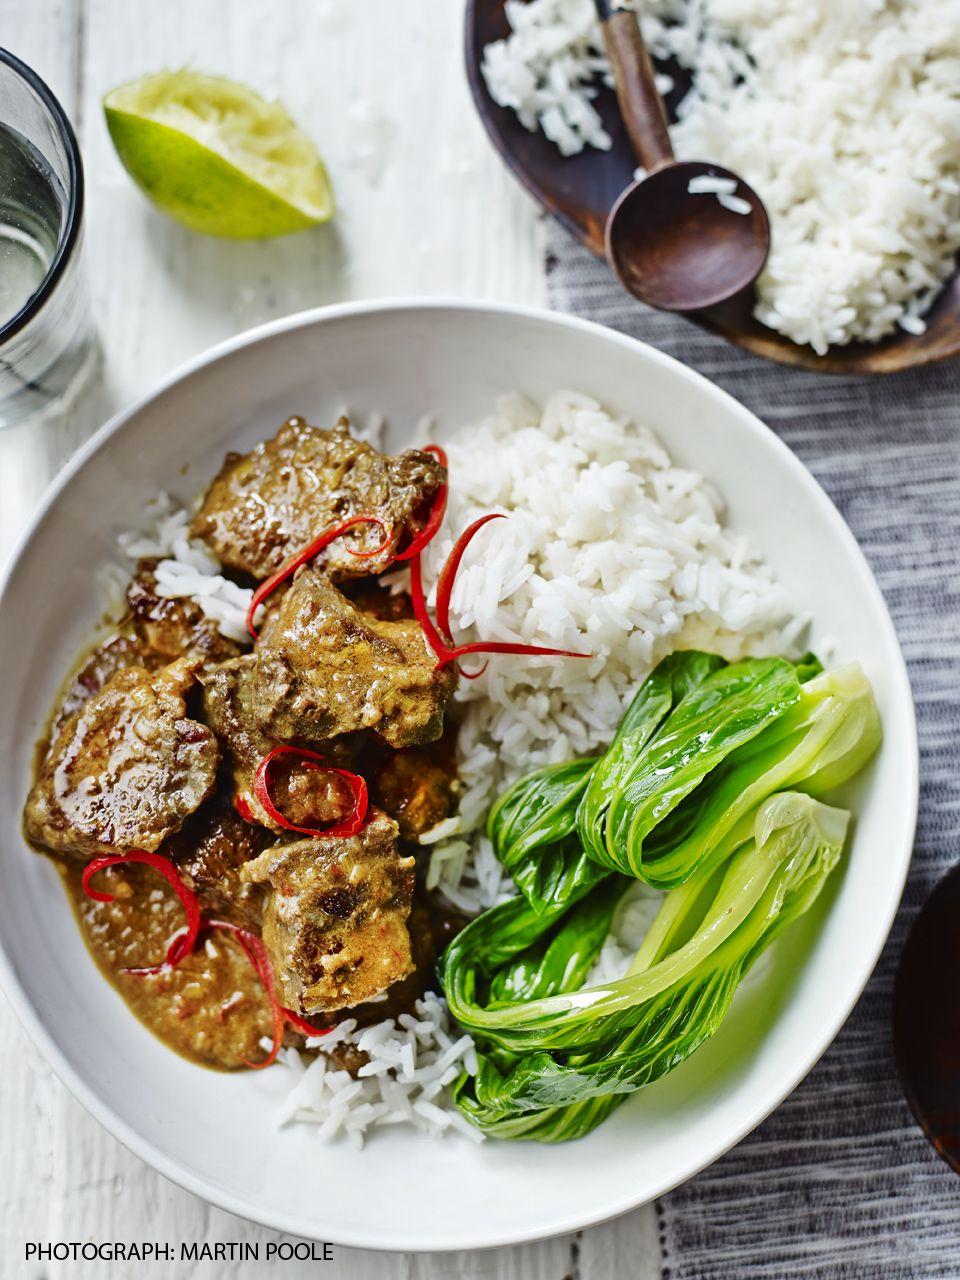 Weekend Curry Bill Granger S Beef Rendang Beef Recipes Indian